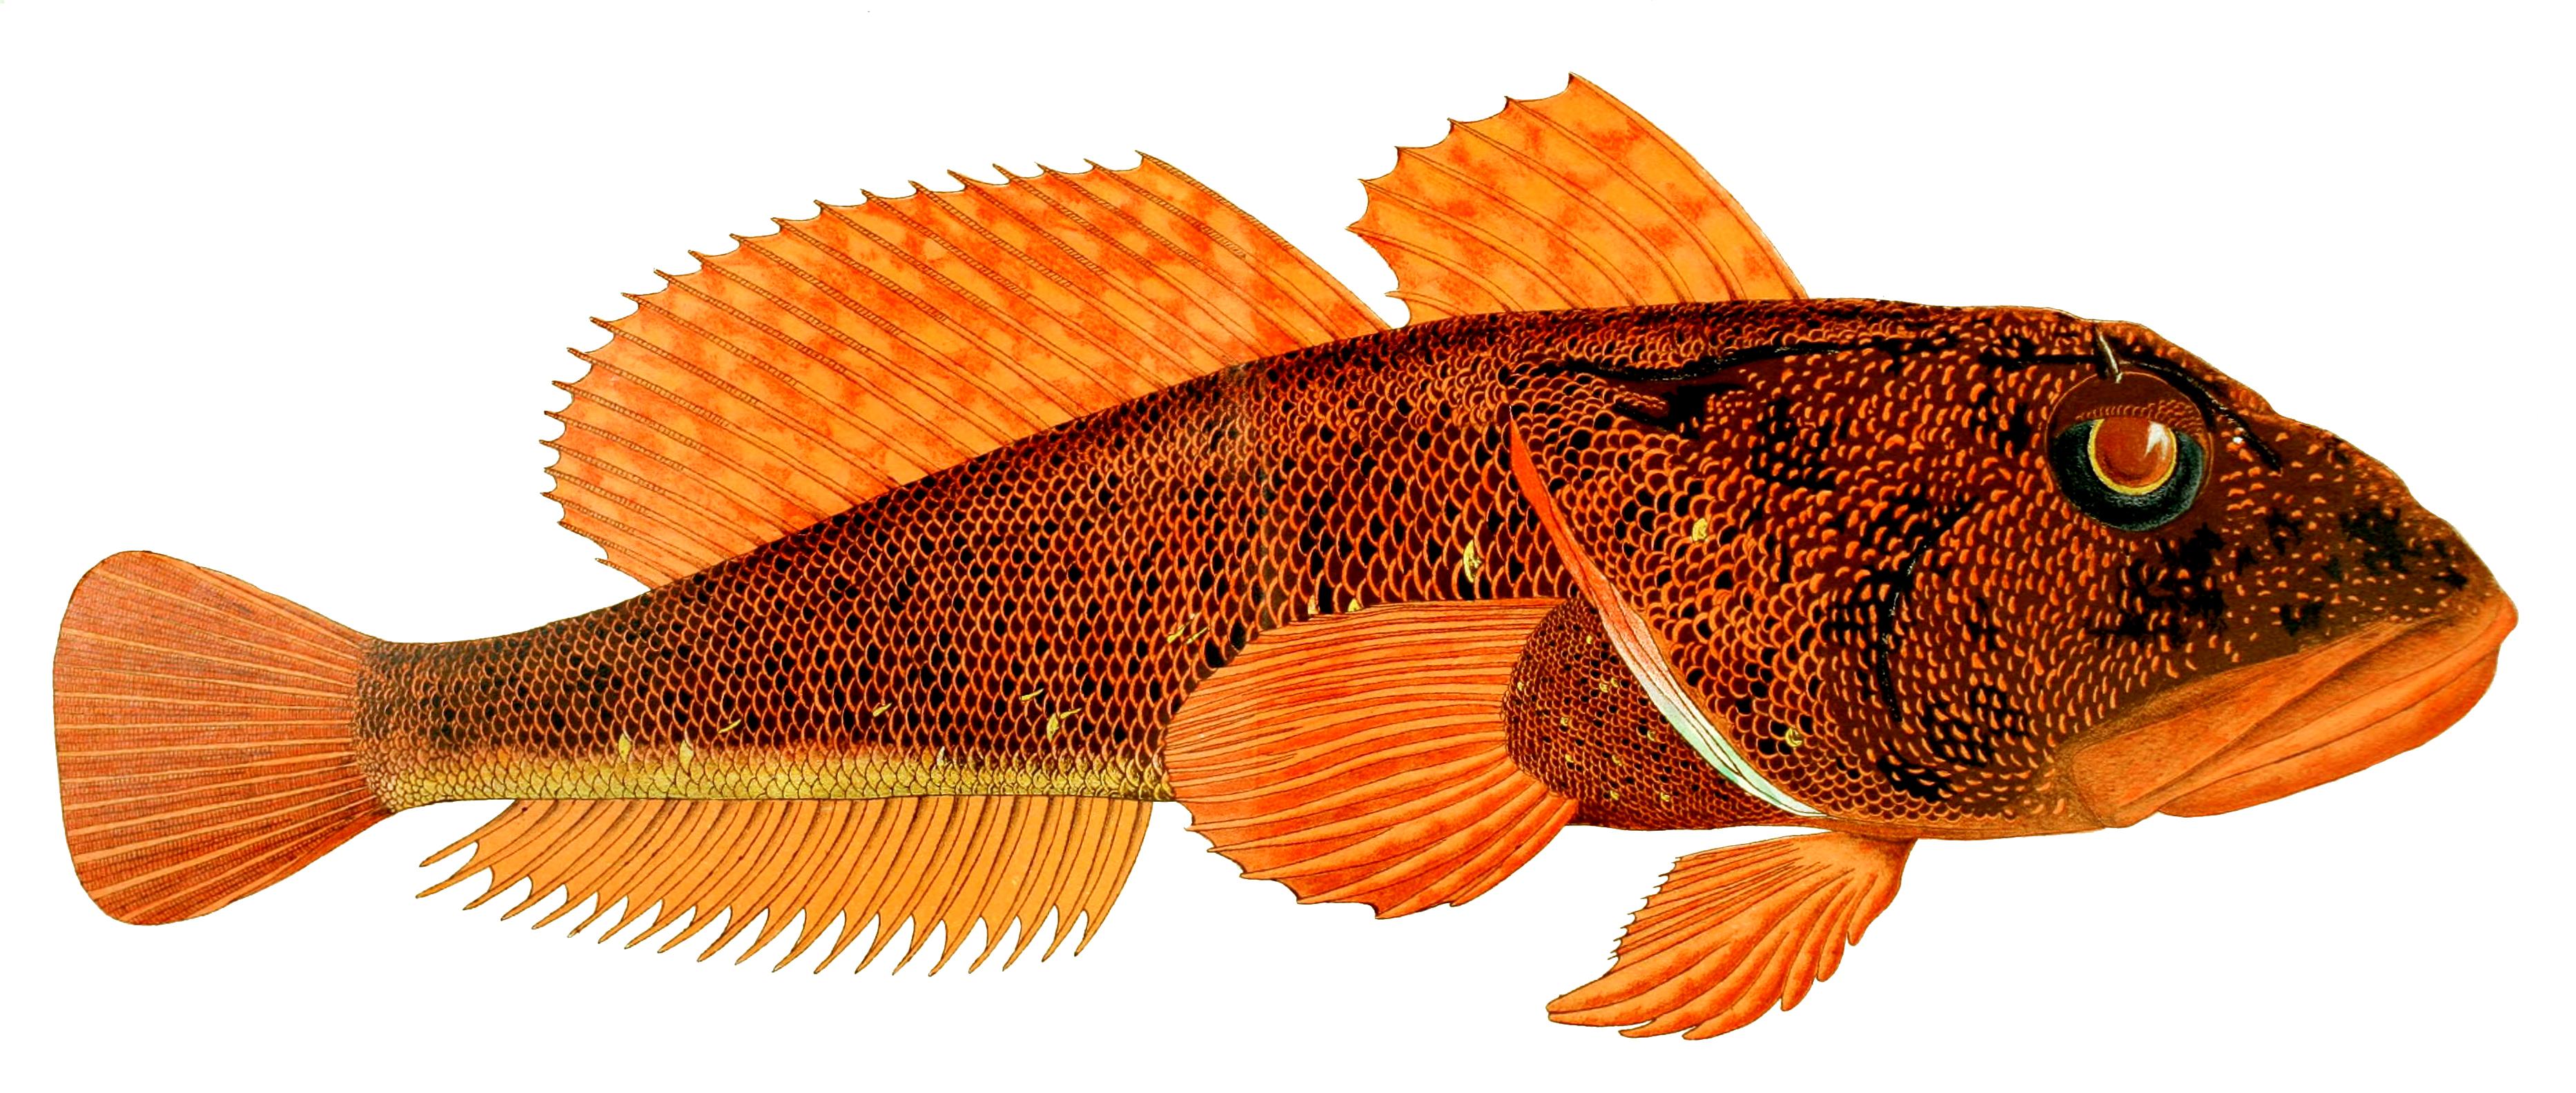 Thornfish wallpaper